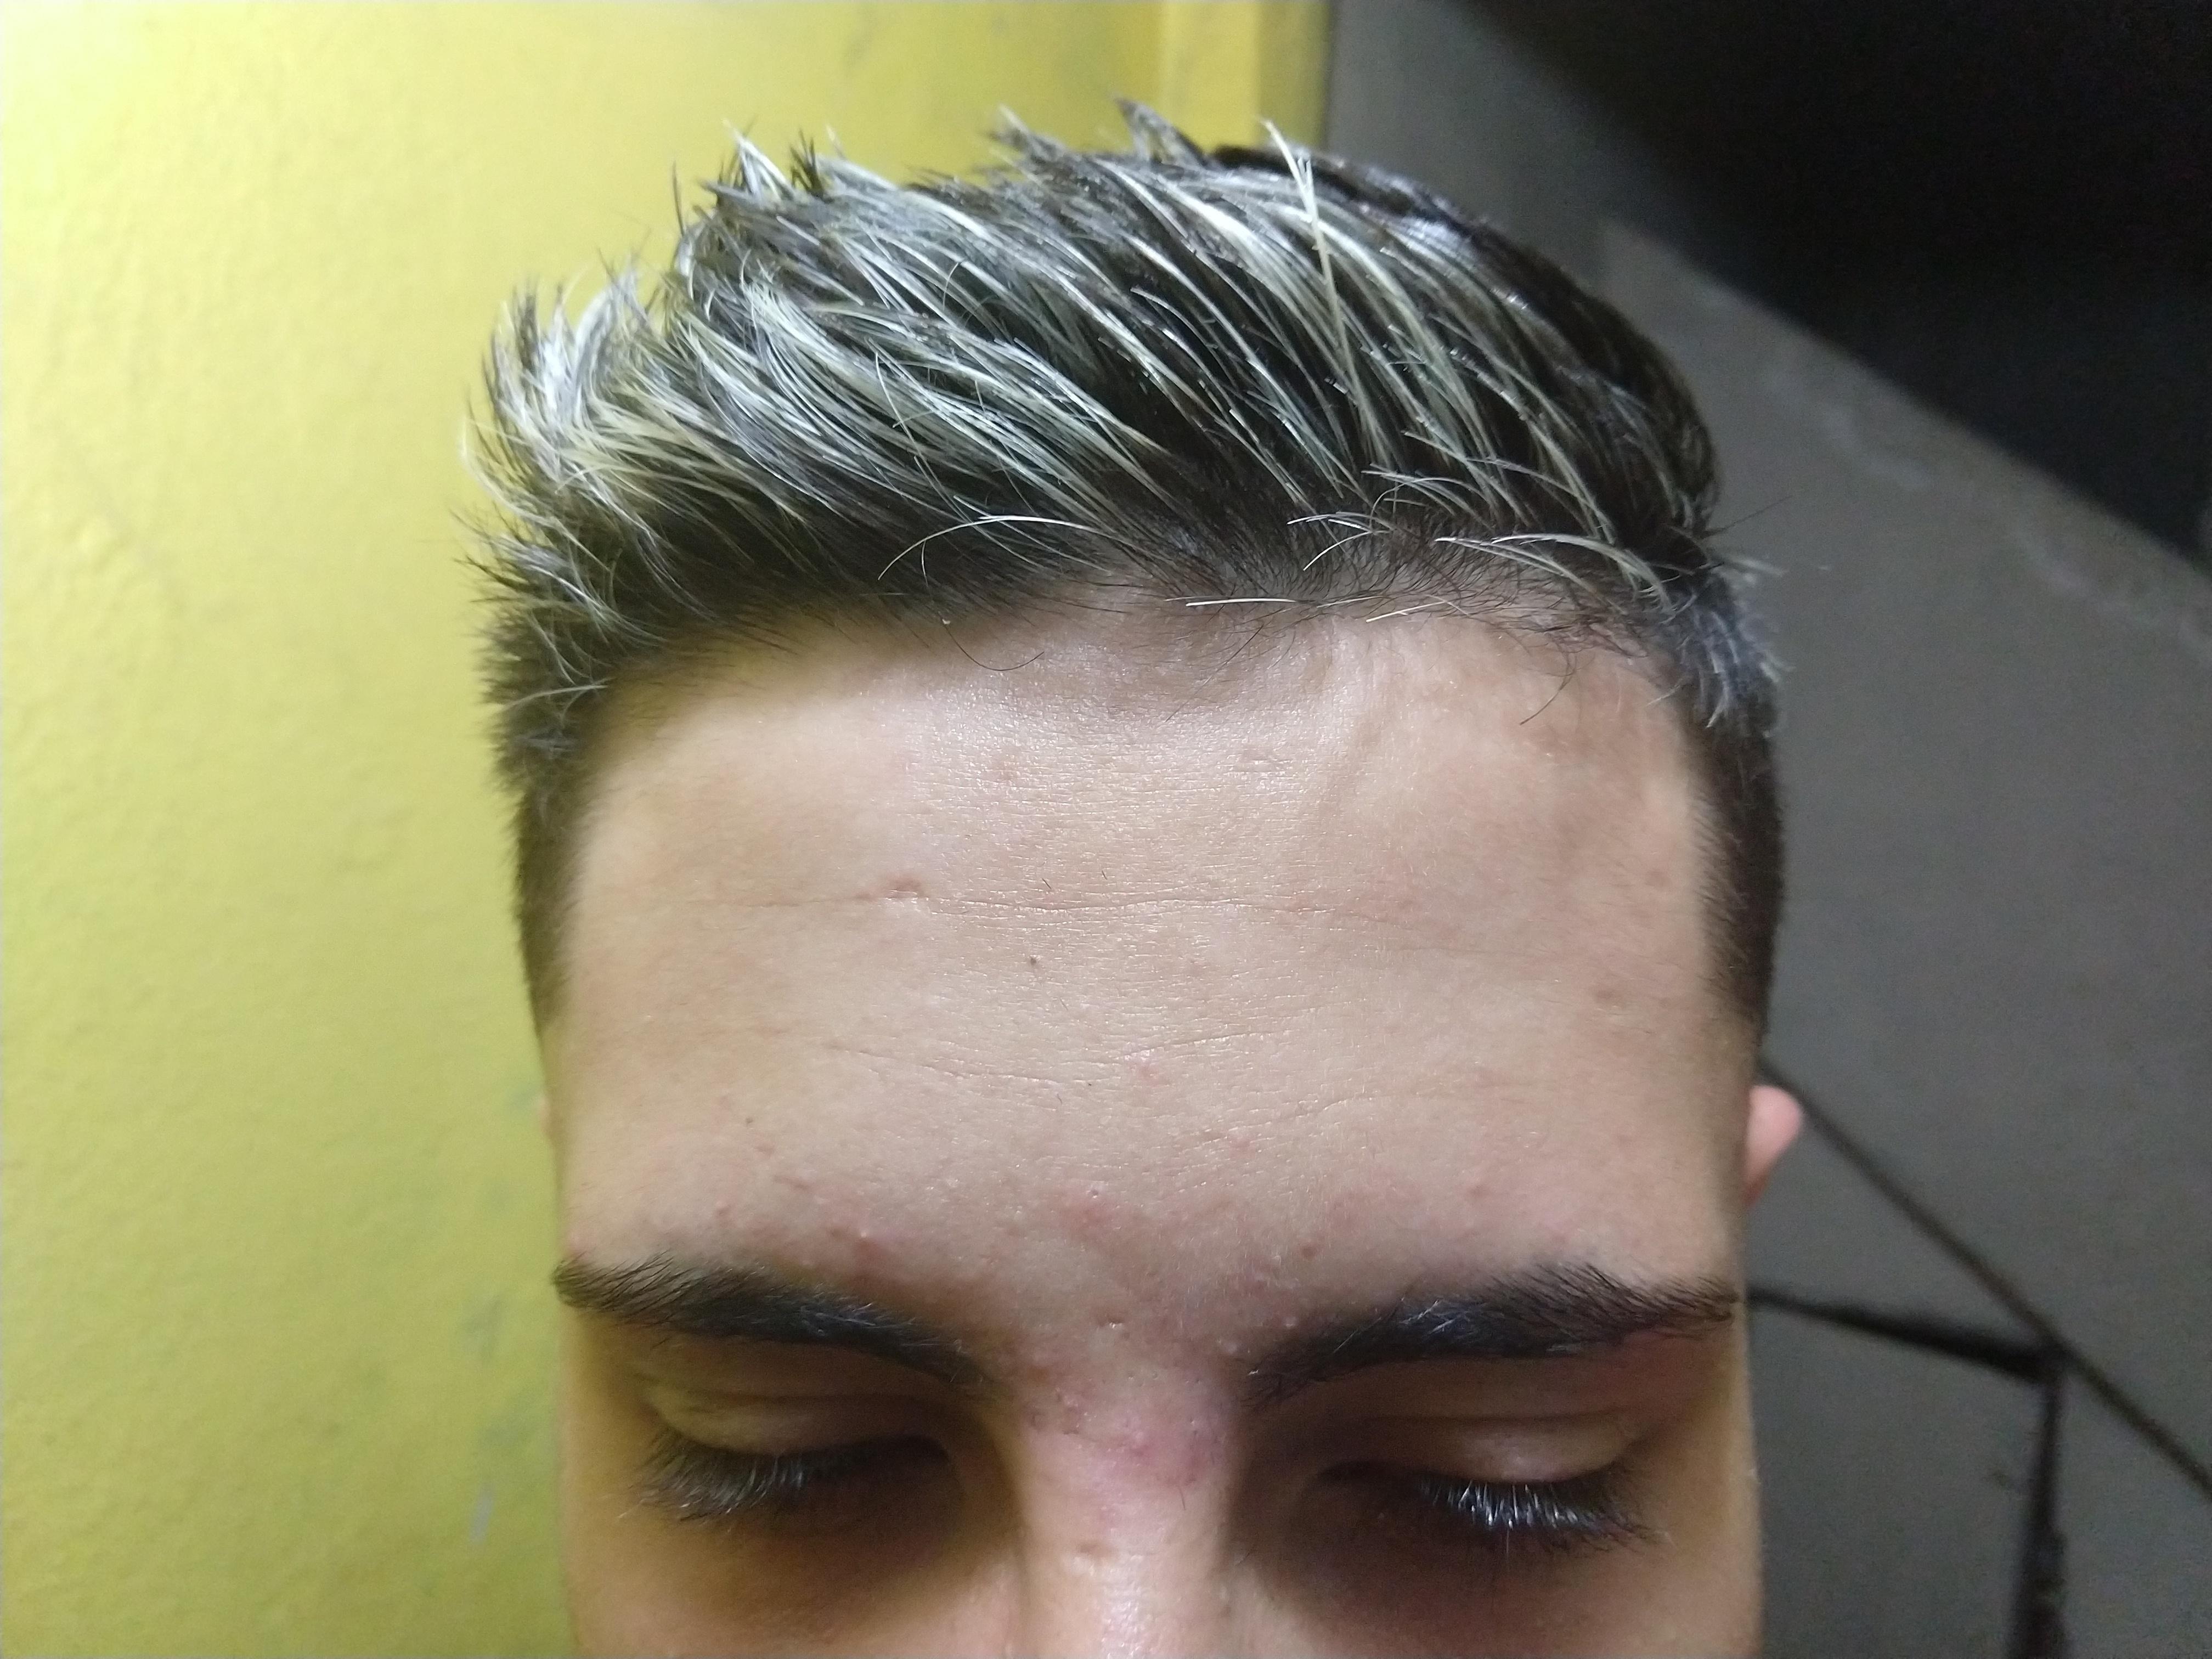 Corte e luzes. cabelo barbeiro(a) estudante